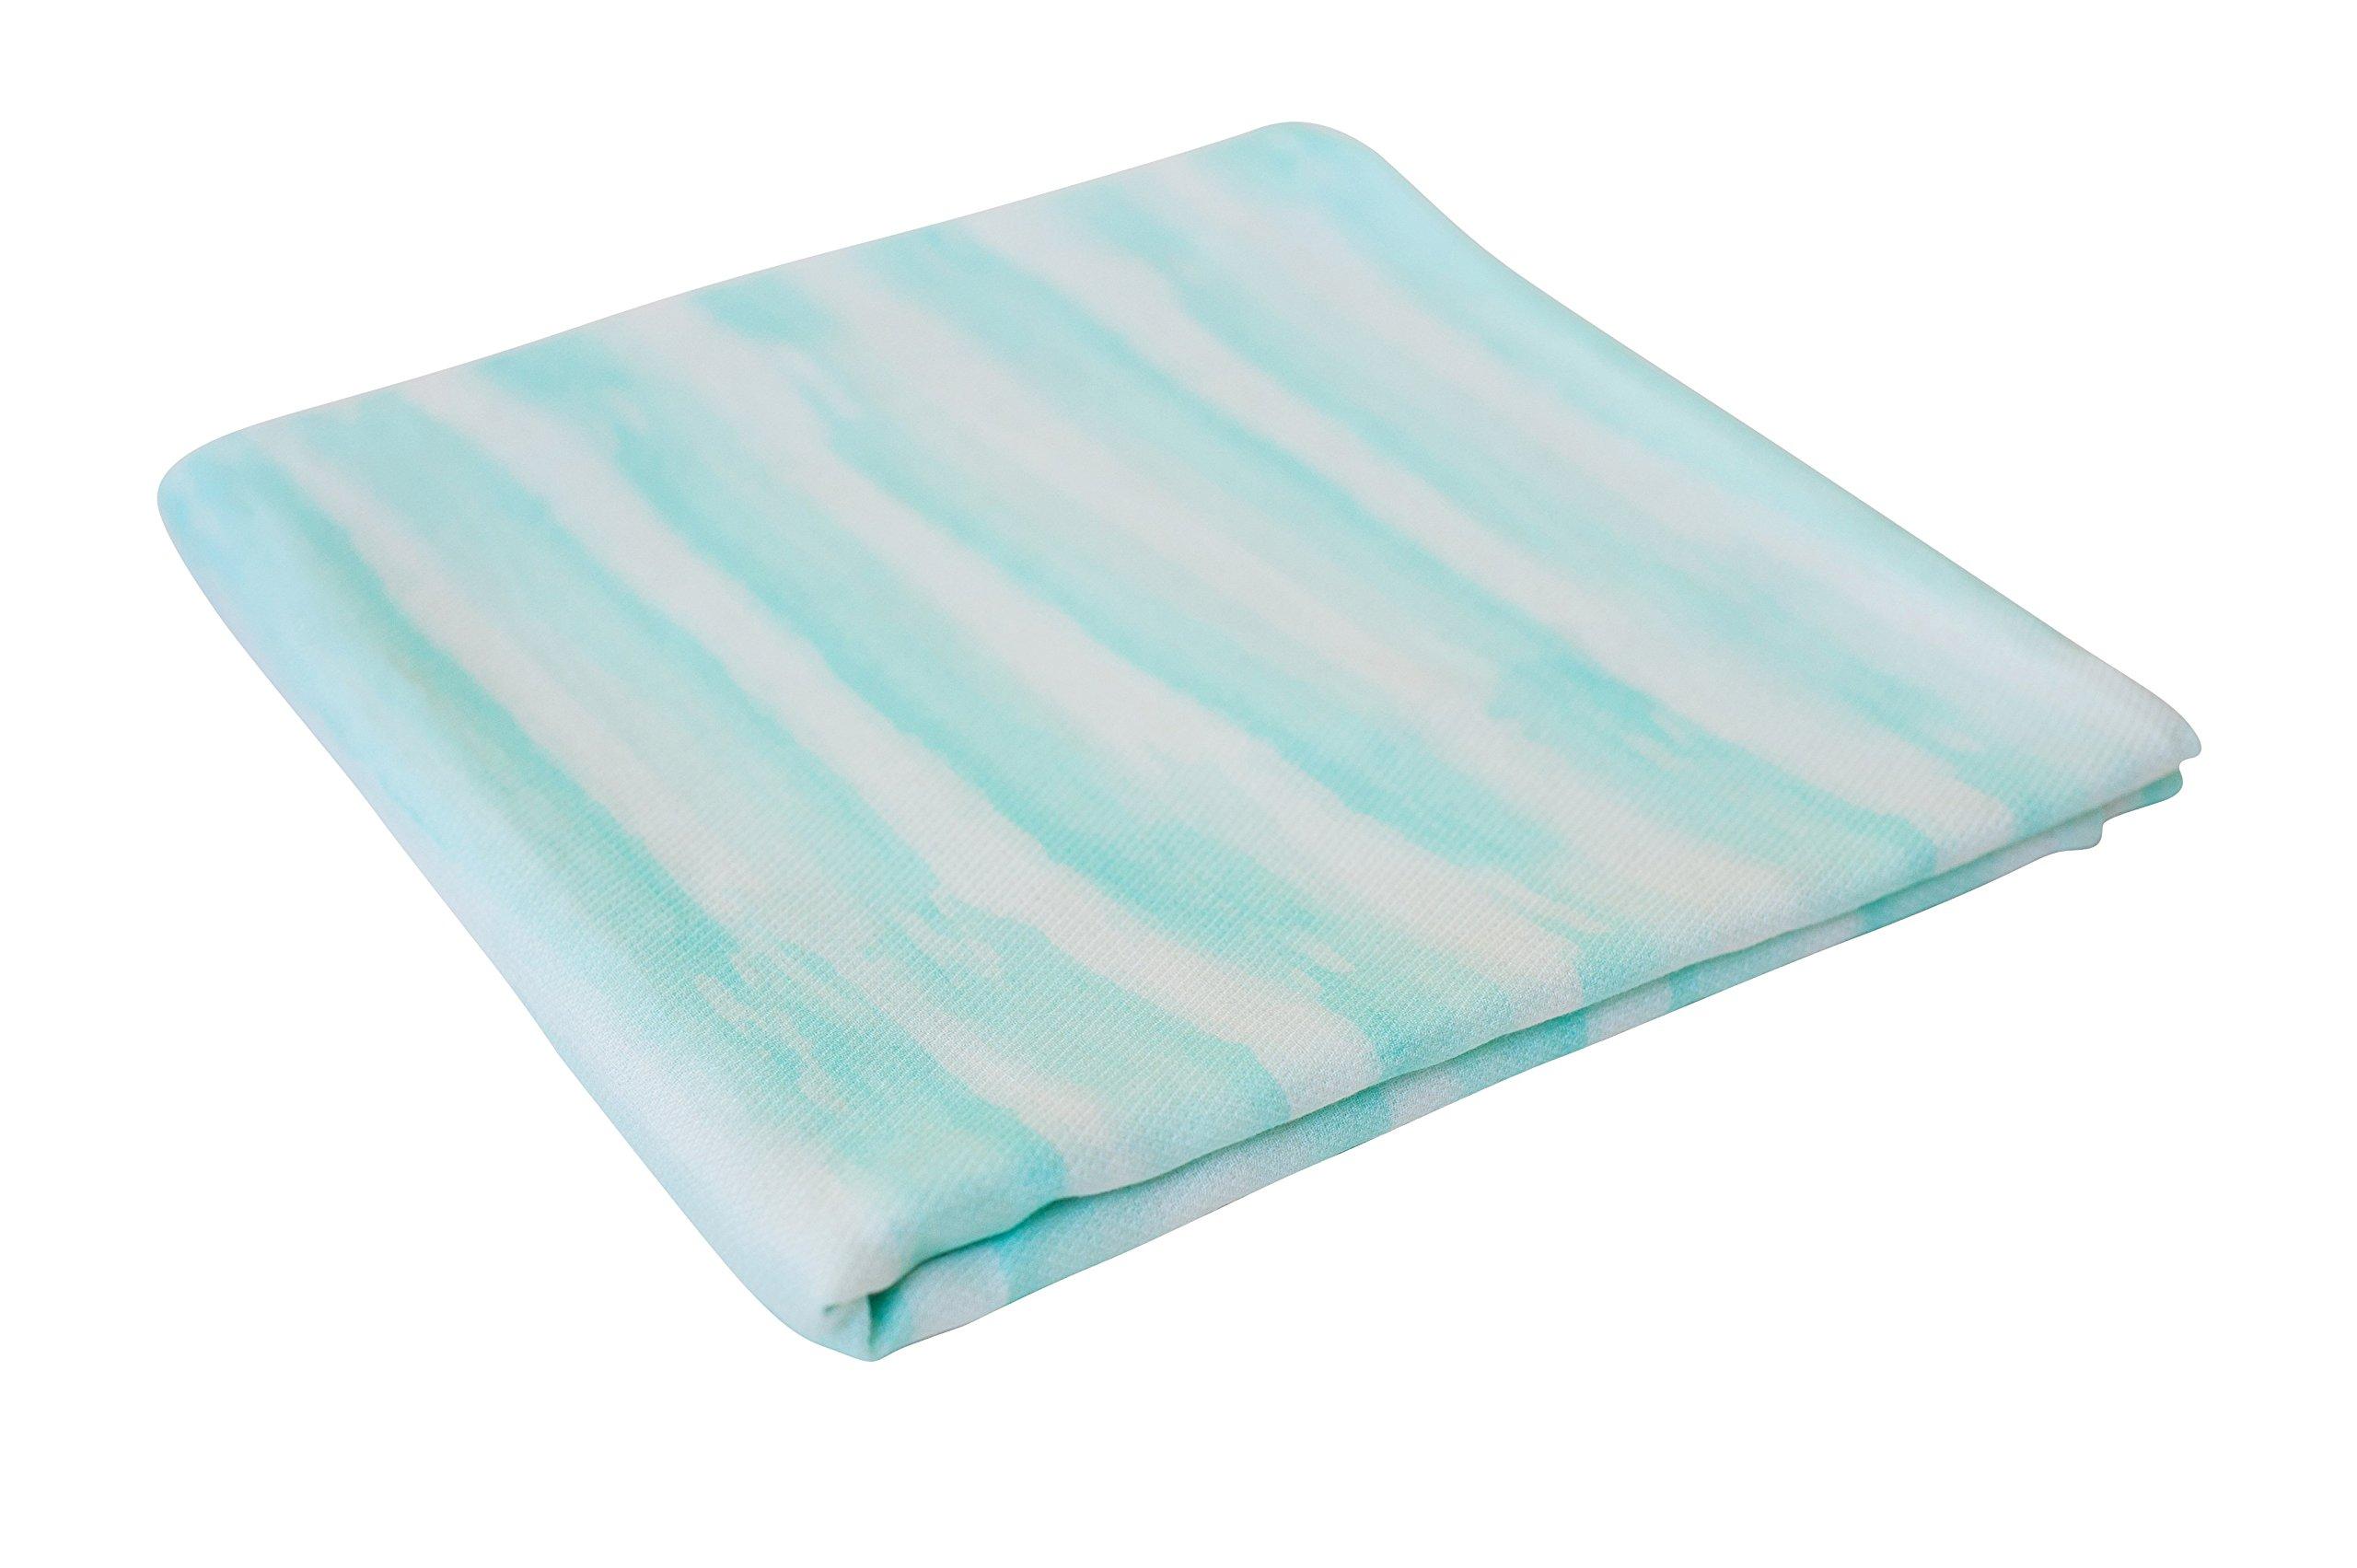 Warm, Soft, Comfortable Swaddle Baby Blanket for Sensitive Skin (Ocean Stripe)